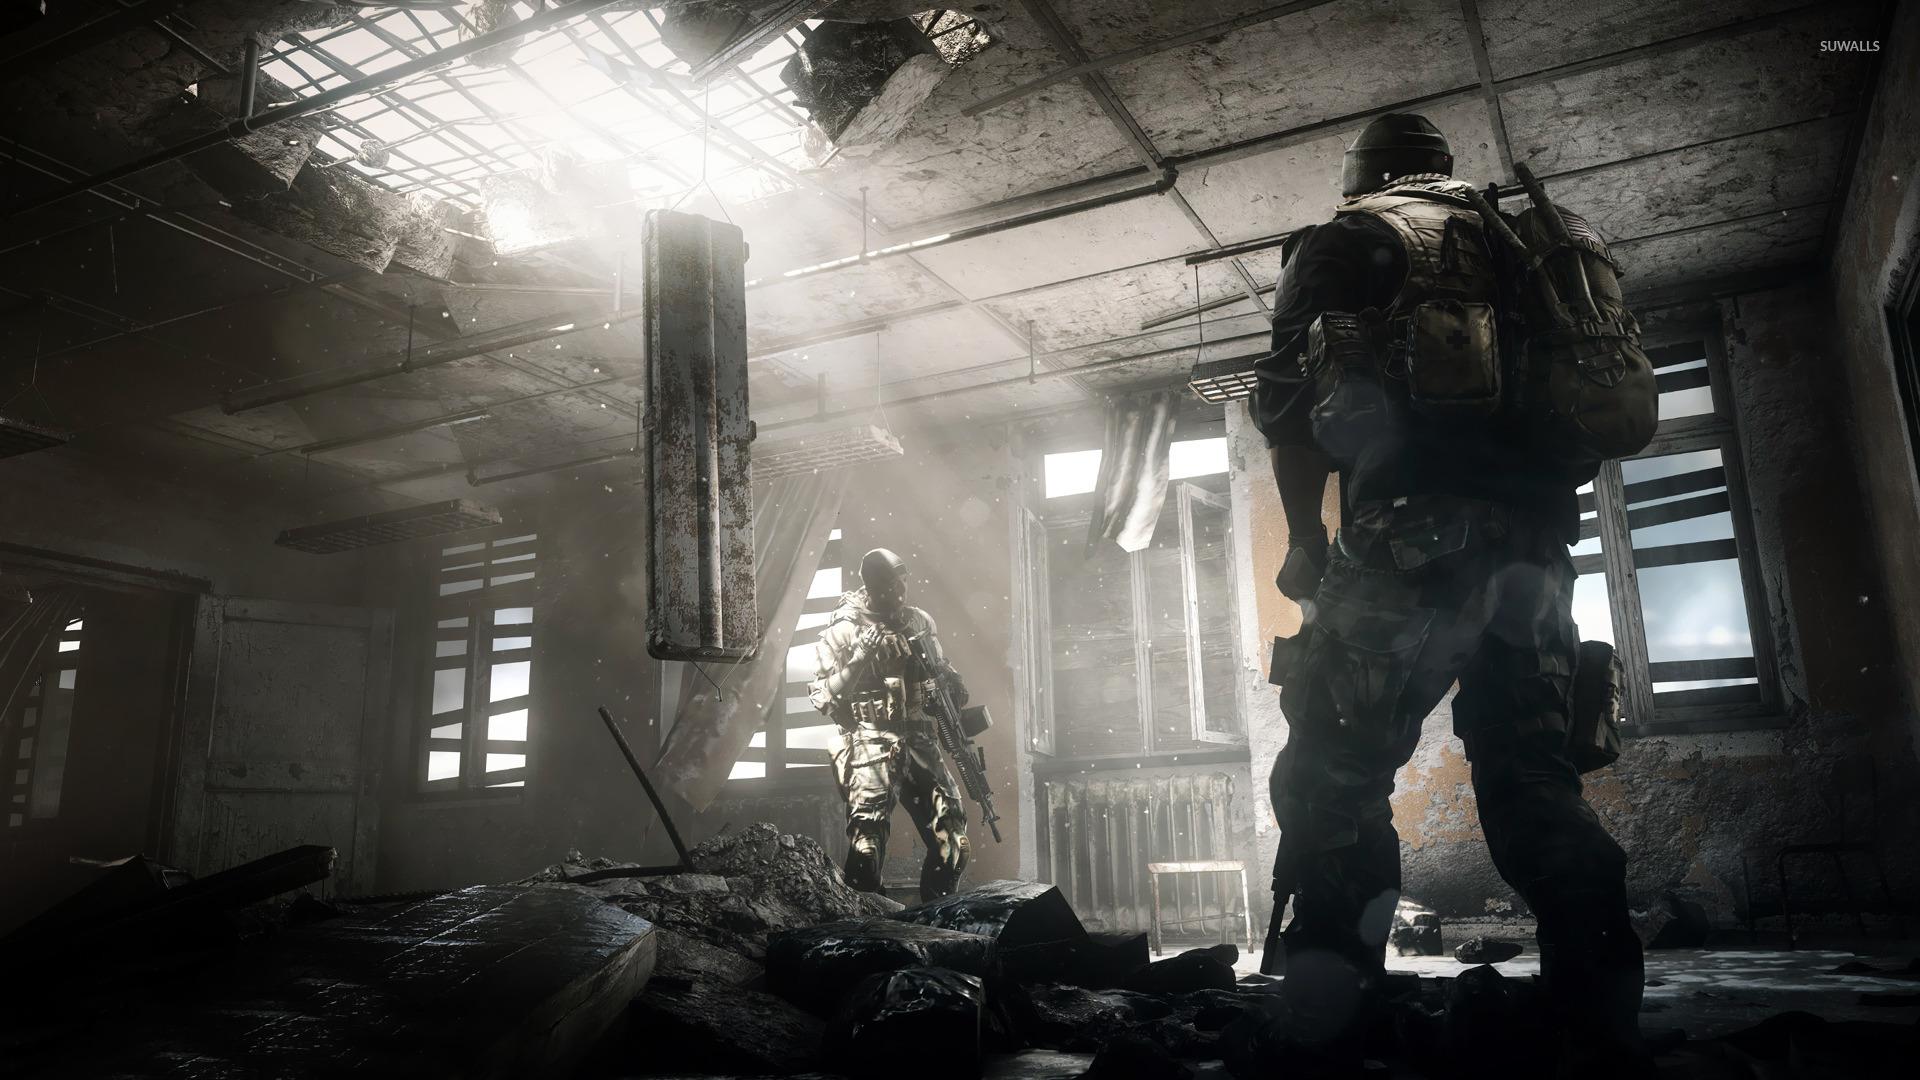 Battlefield 4 [24] wallpaper - Game wallpapers - #21771